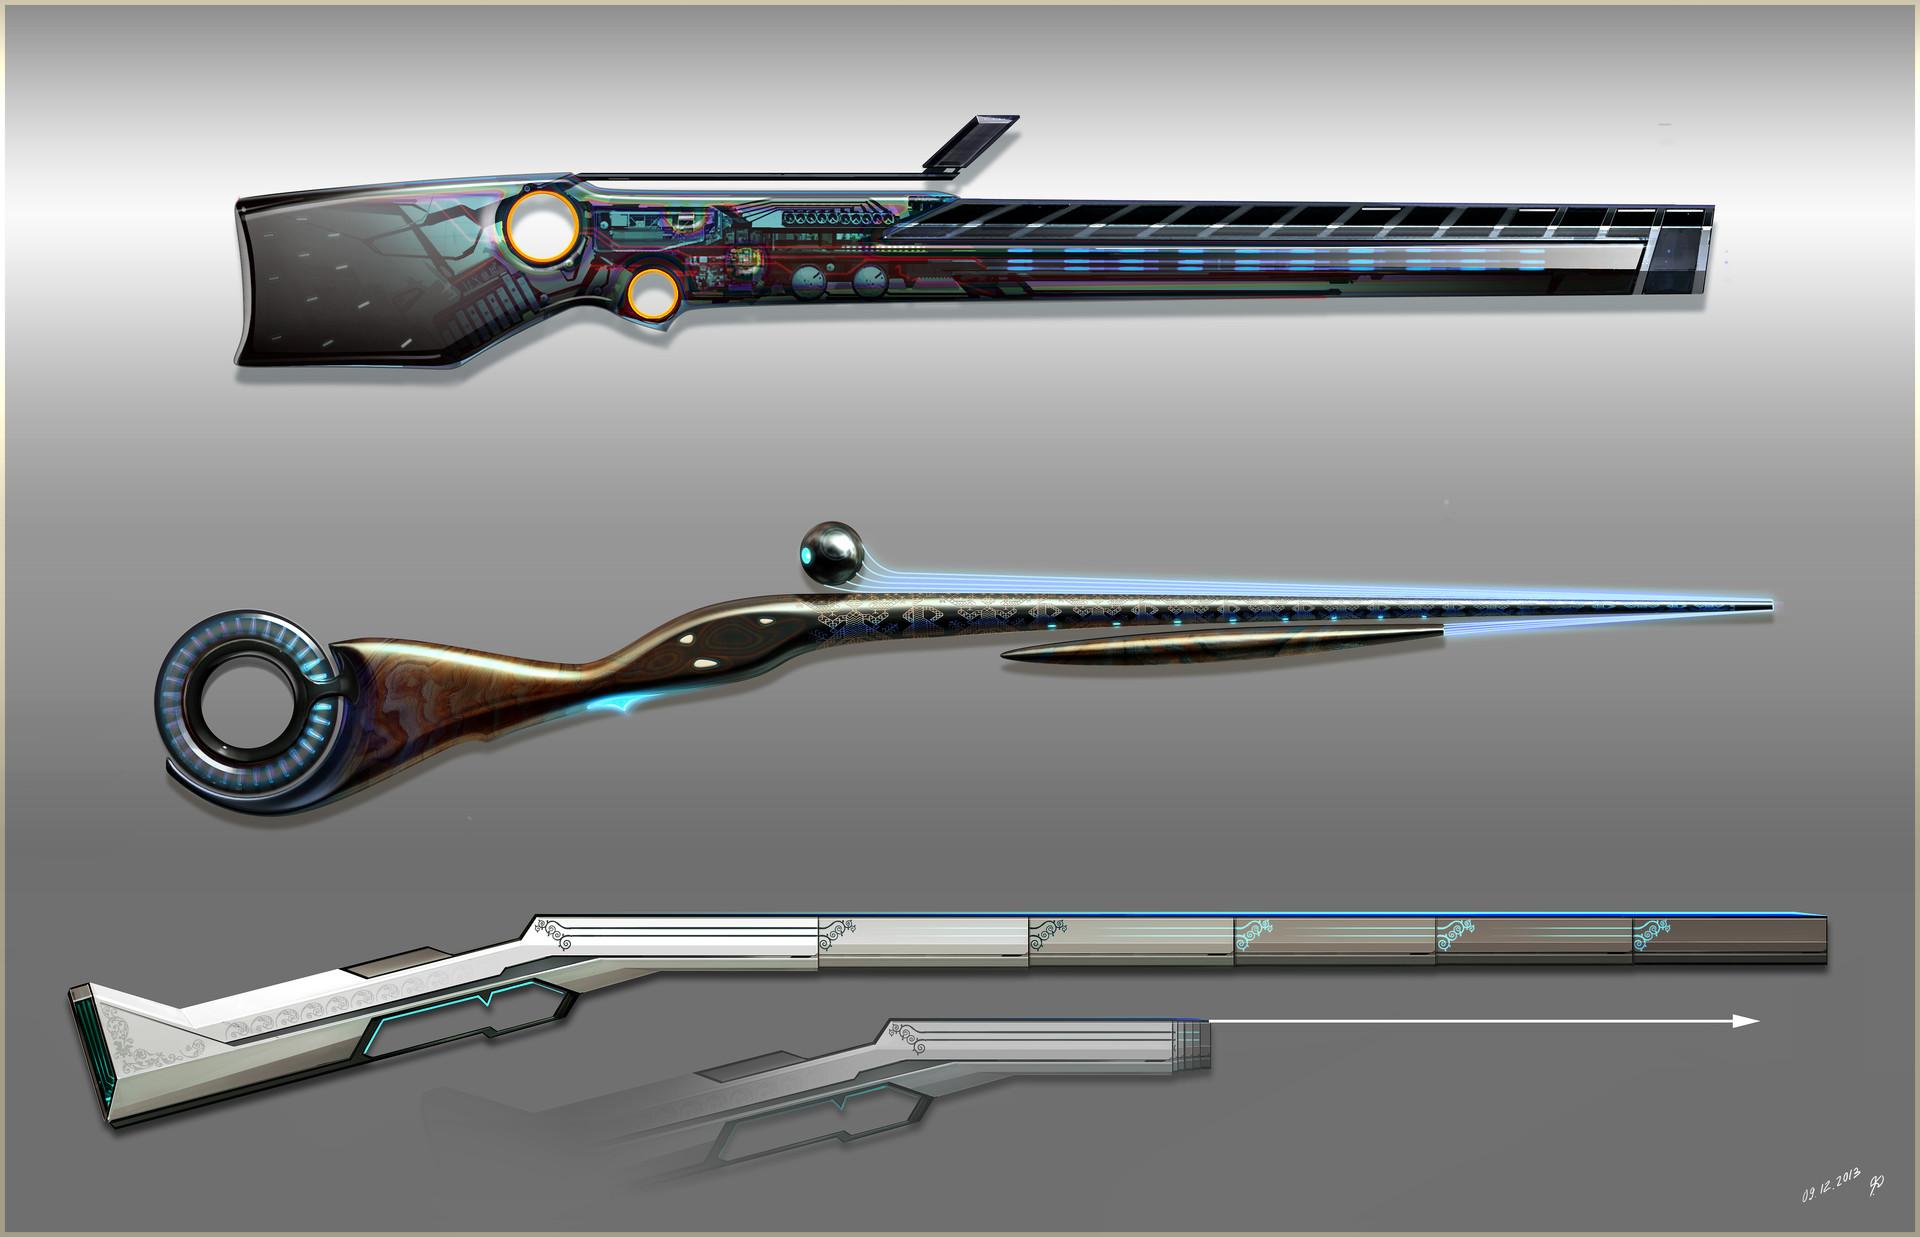 timur-mutsaev-weapons-te7.jpg?1459411535